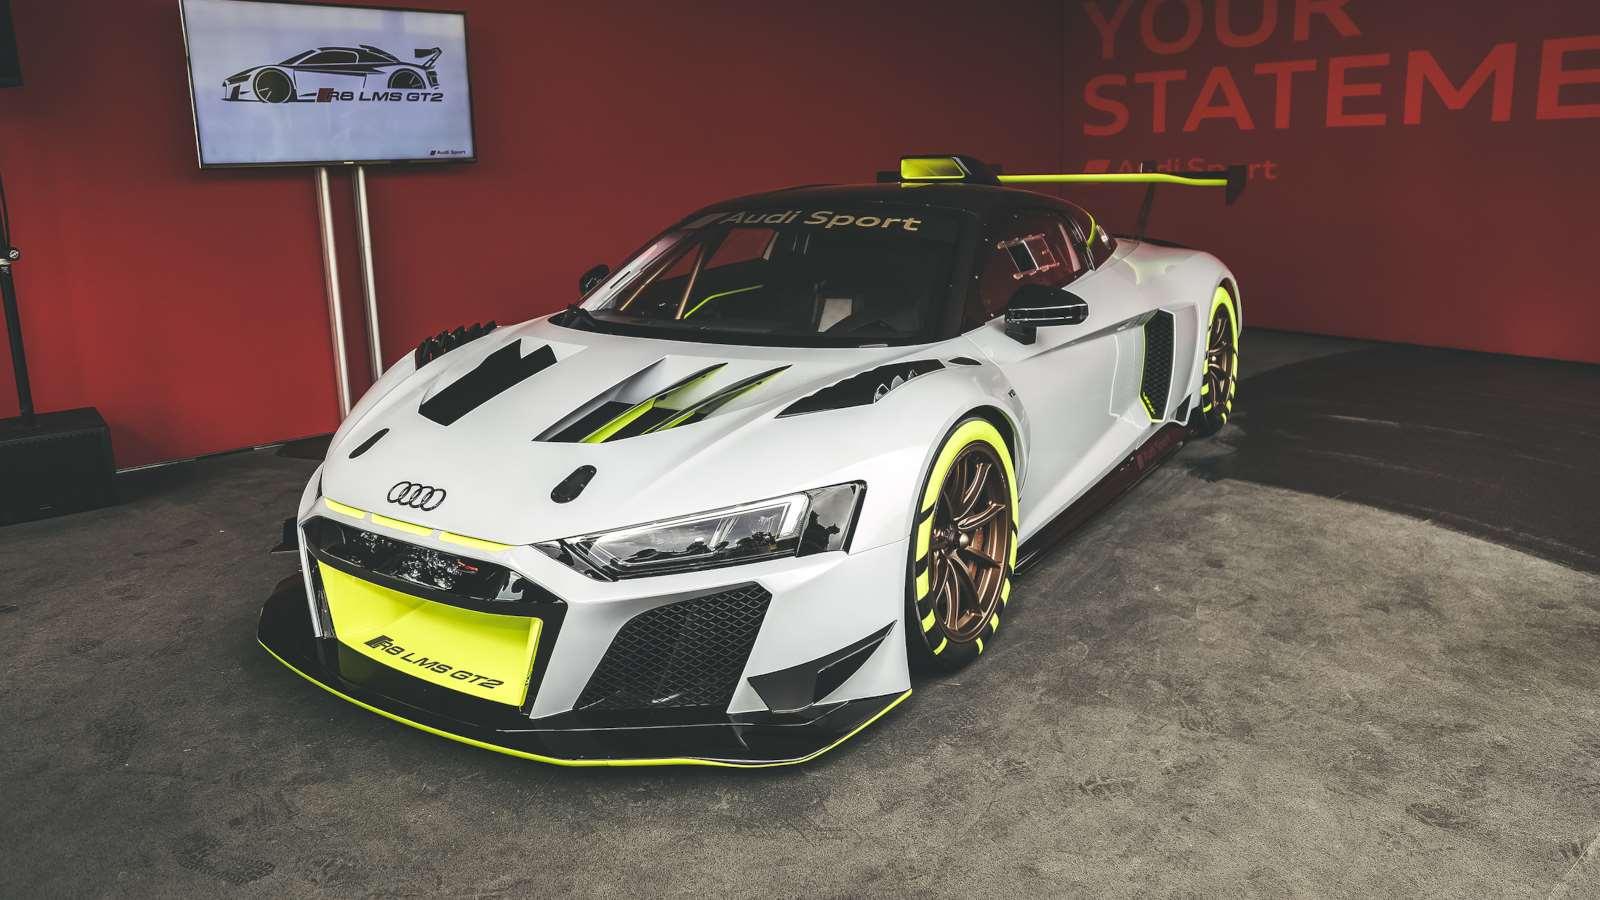 Audi R8 LMS GT2 the ultimate customer race car 1600x900